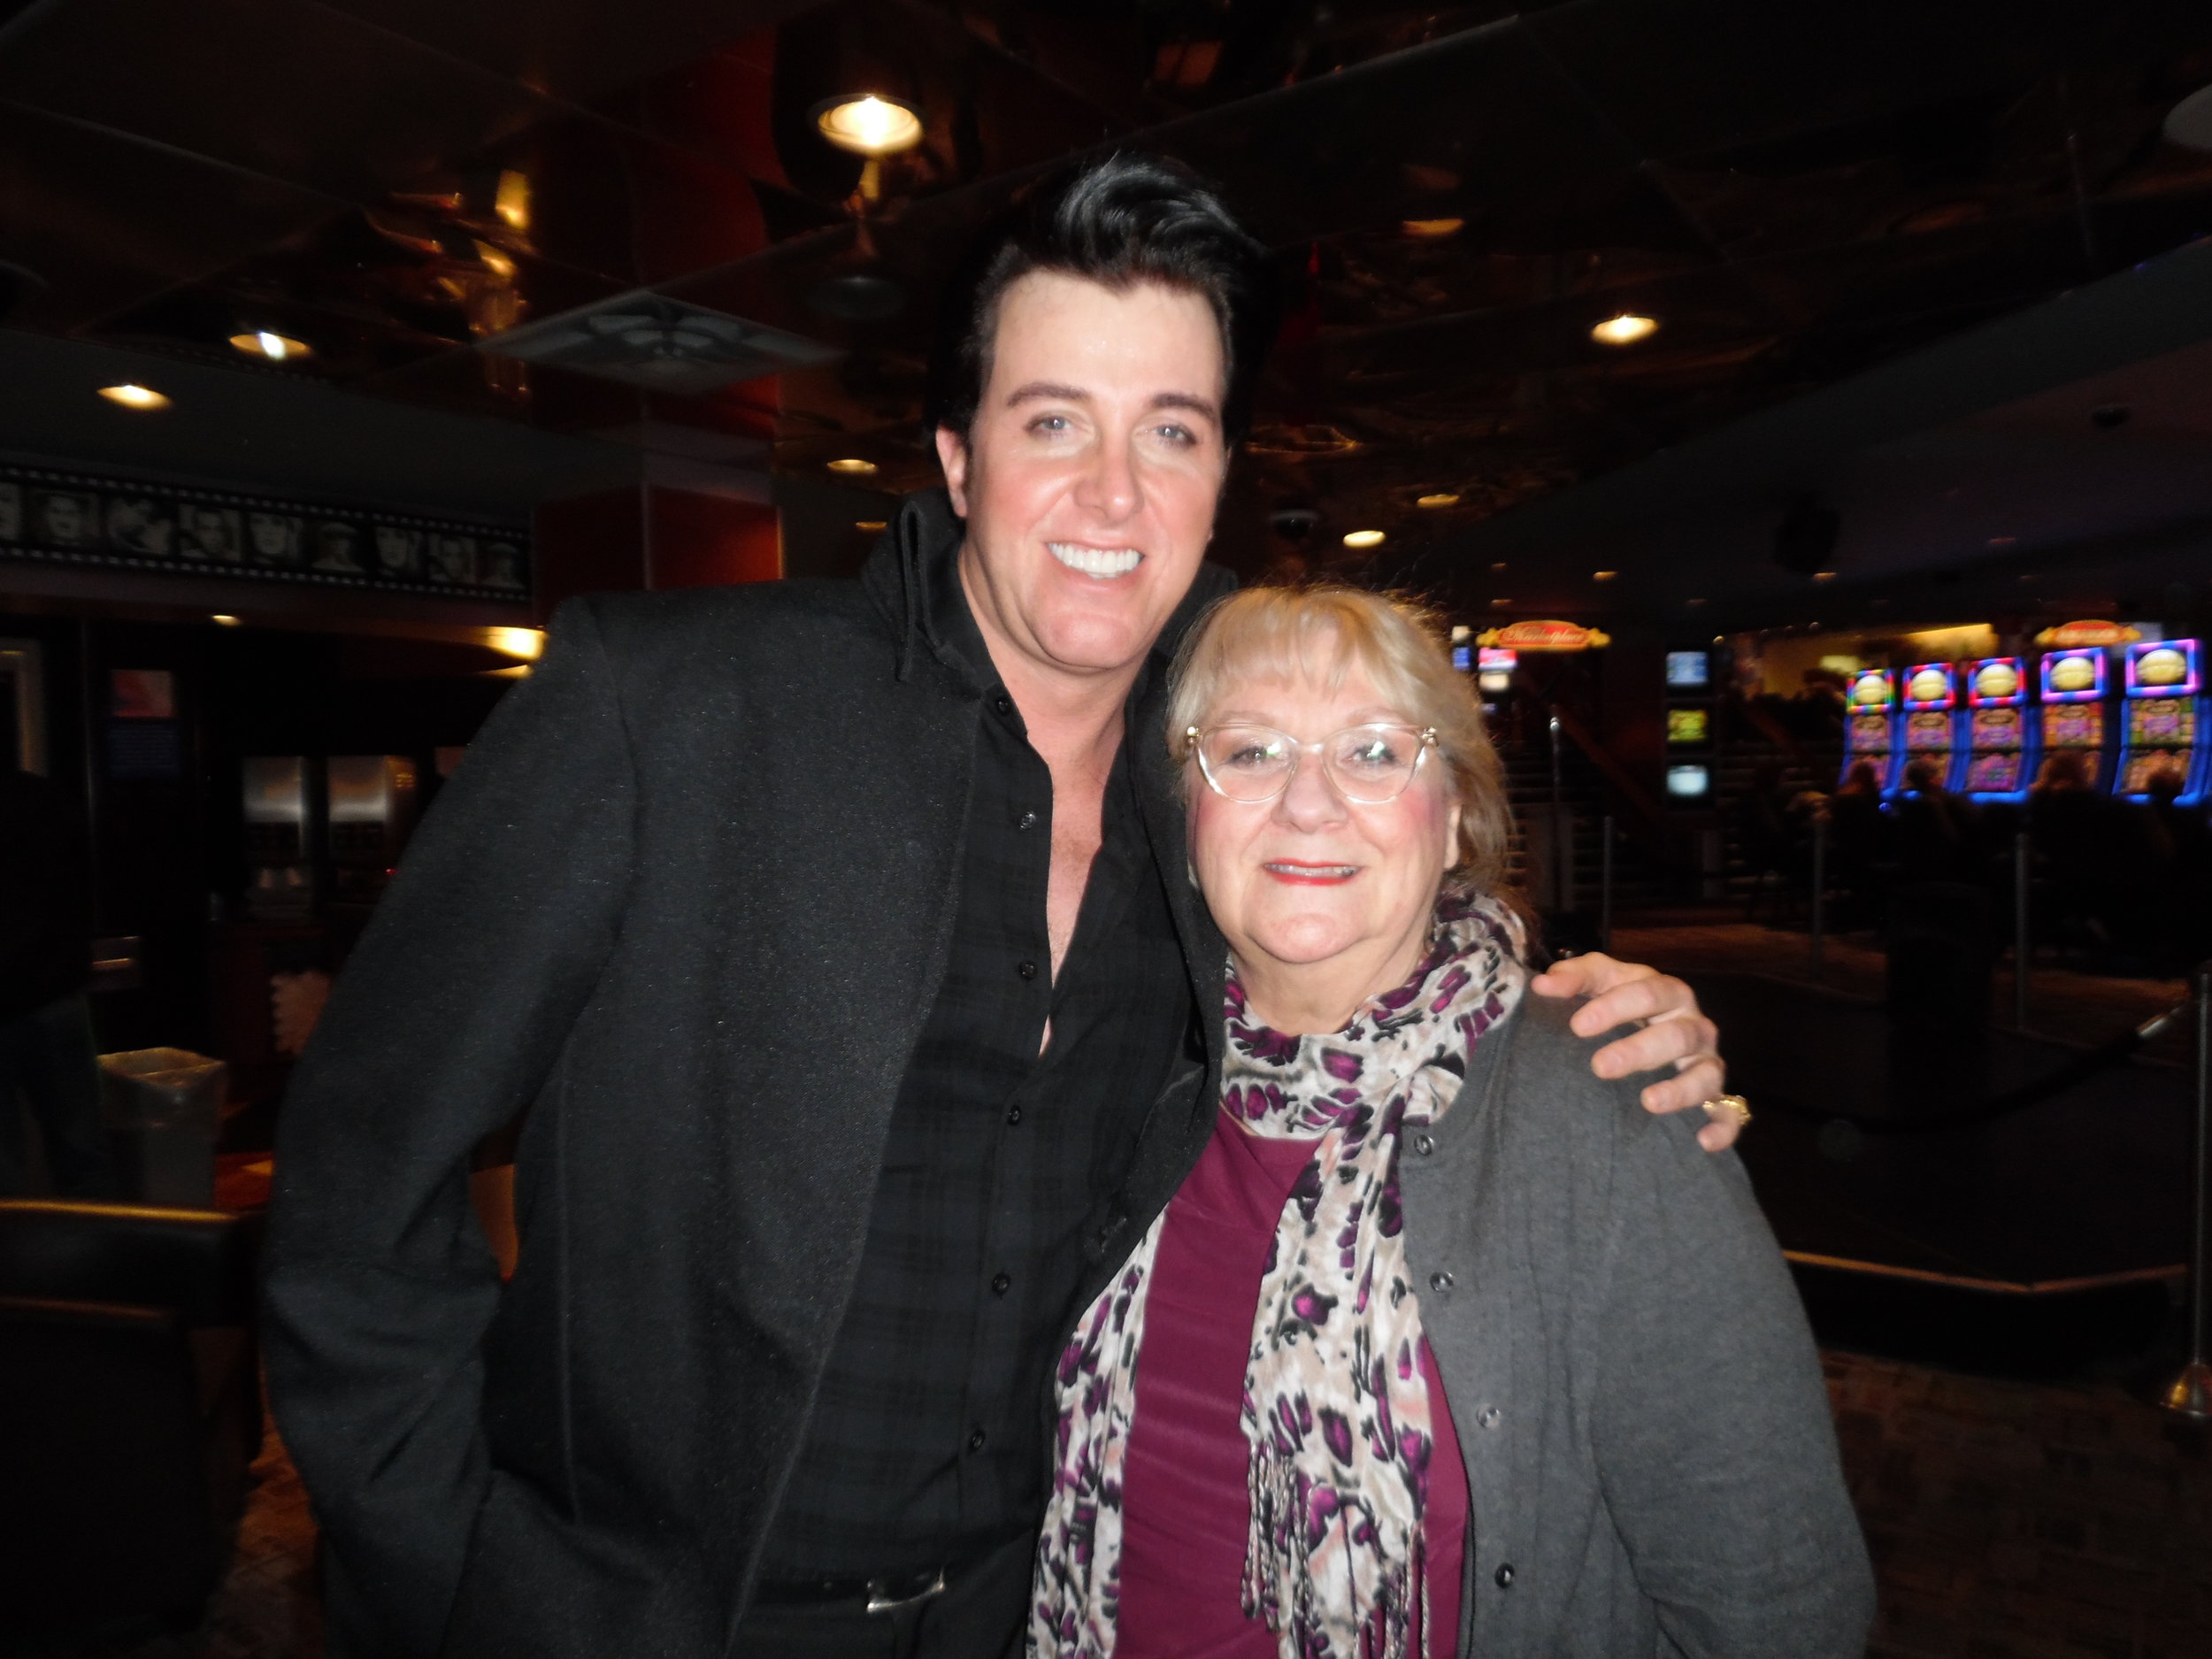 ETA  Matt Cage  and Carolyn. What a fabulous night of entertainment! Thanks, Matt!